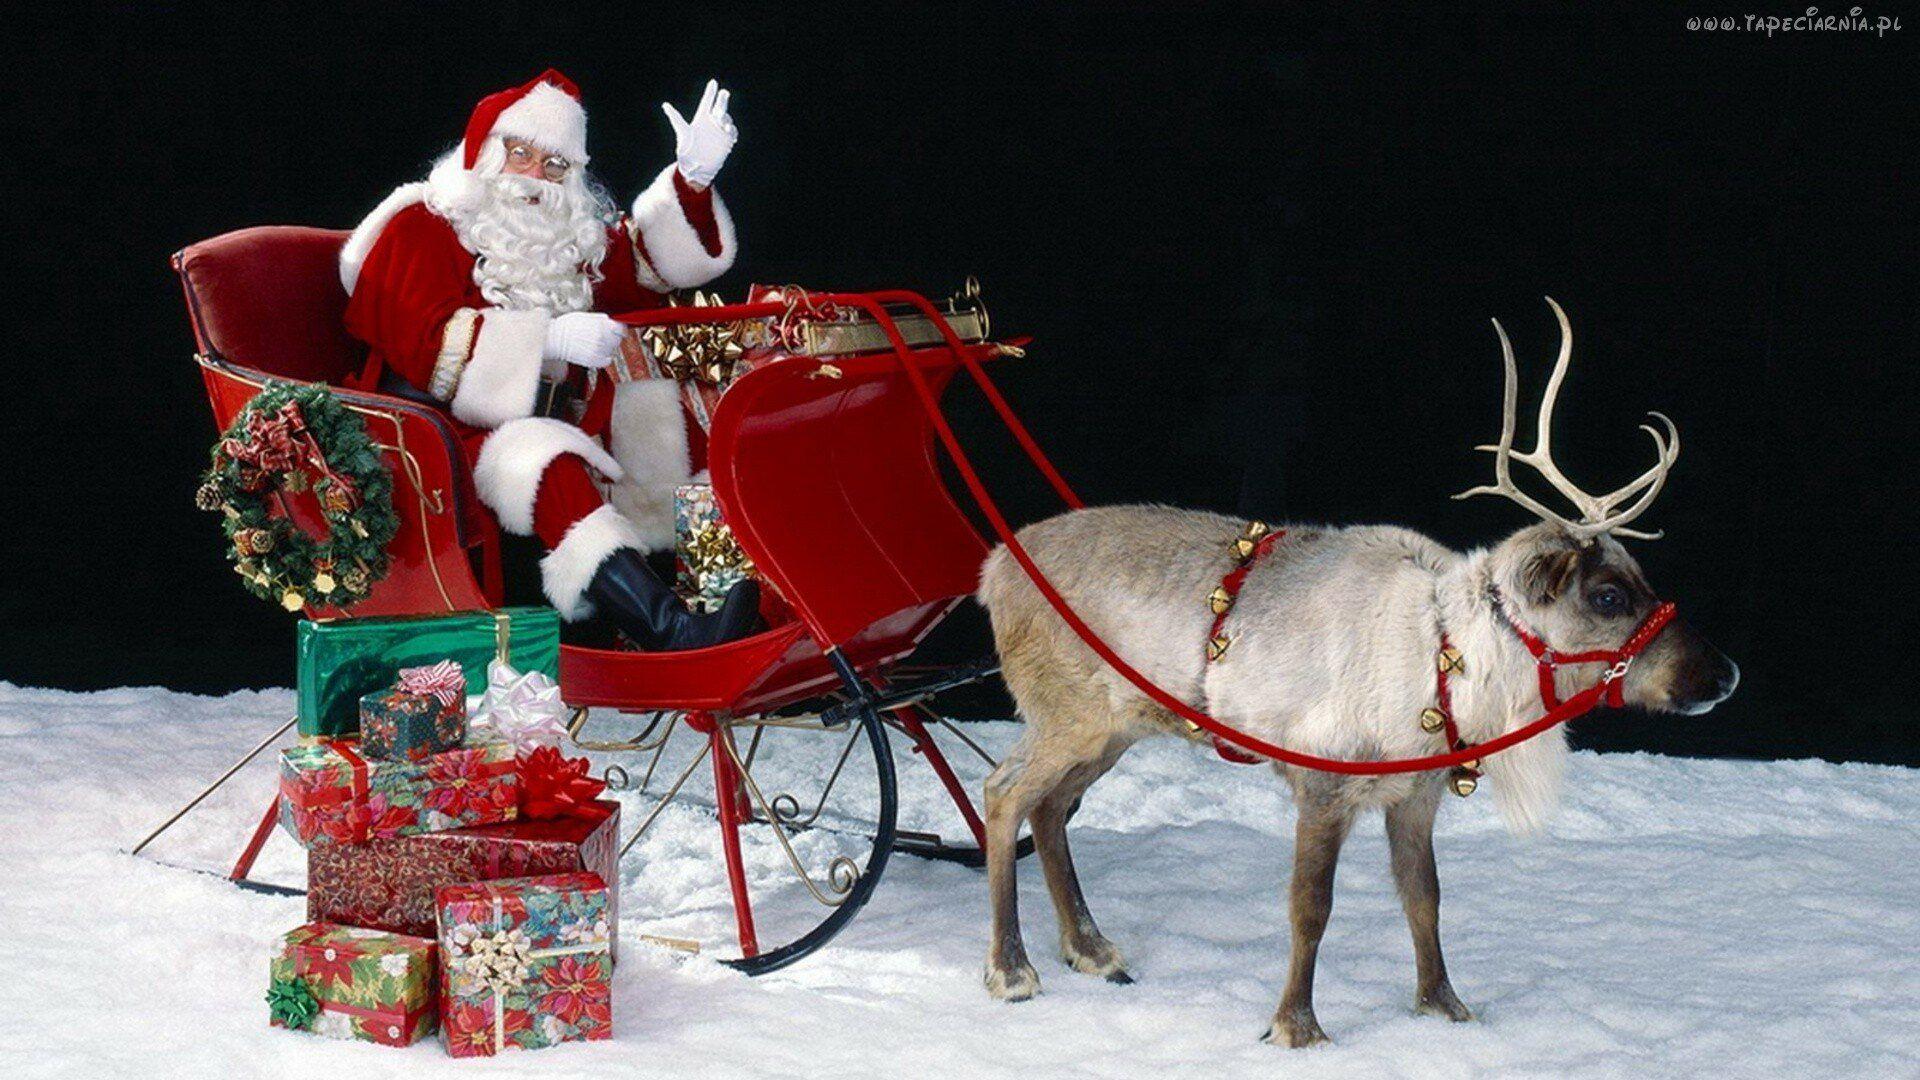 Christmas Sleigh PC Wallpaper HD